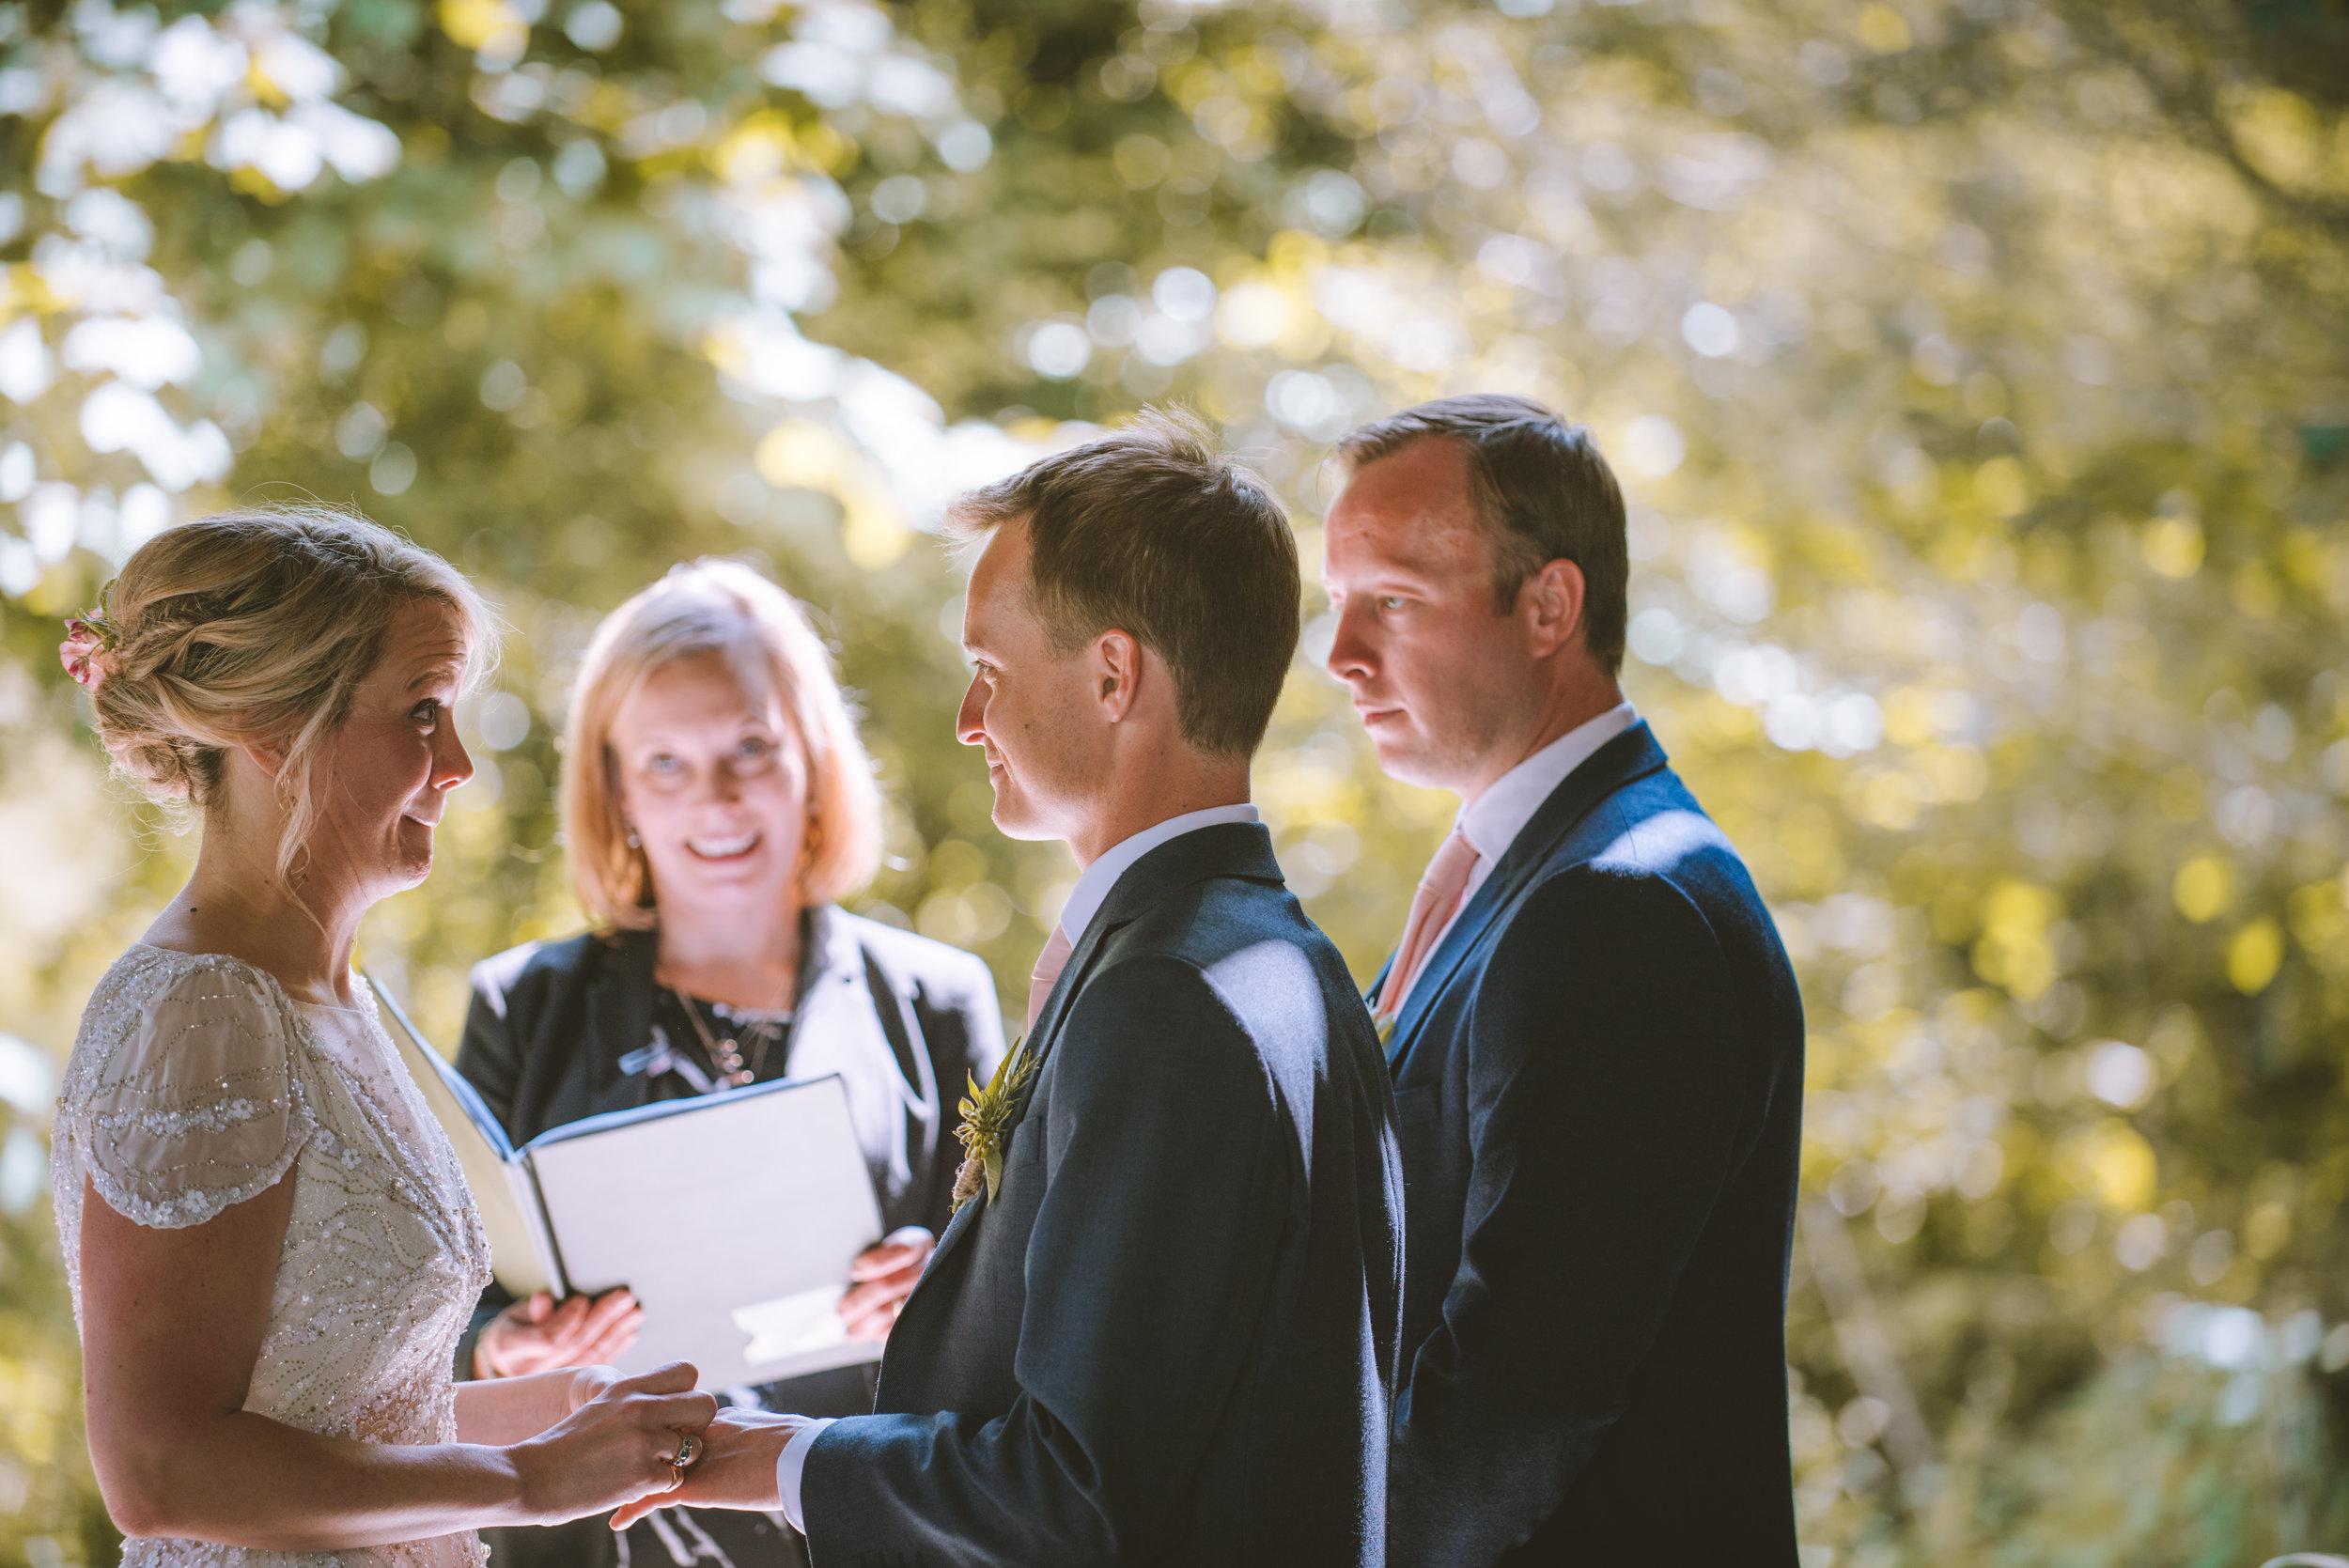 nancarrow-wedding-photography-34.jpg